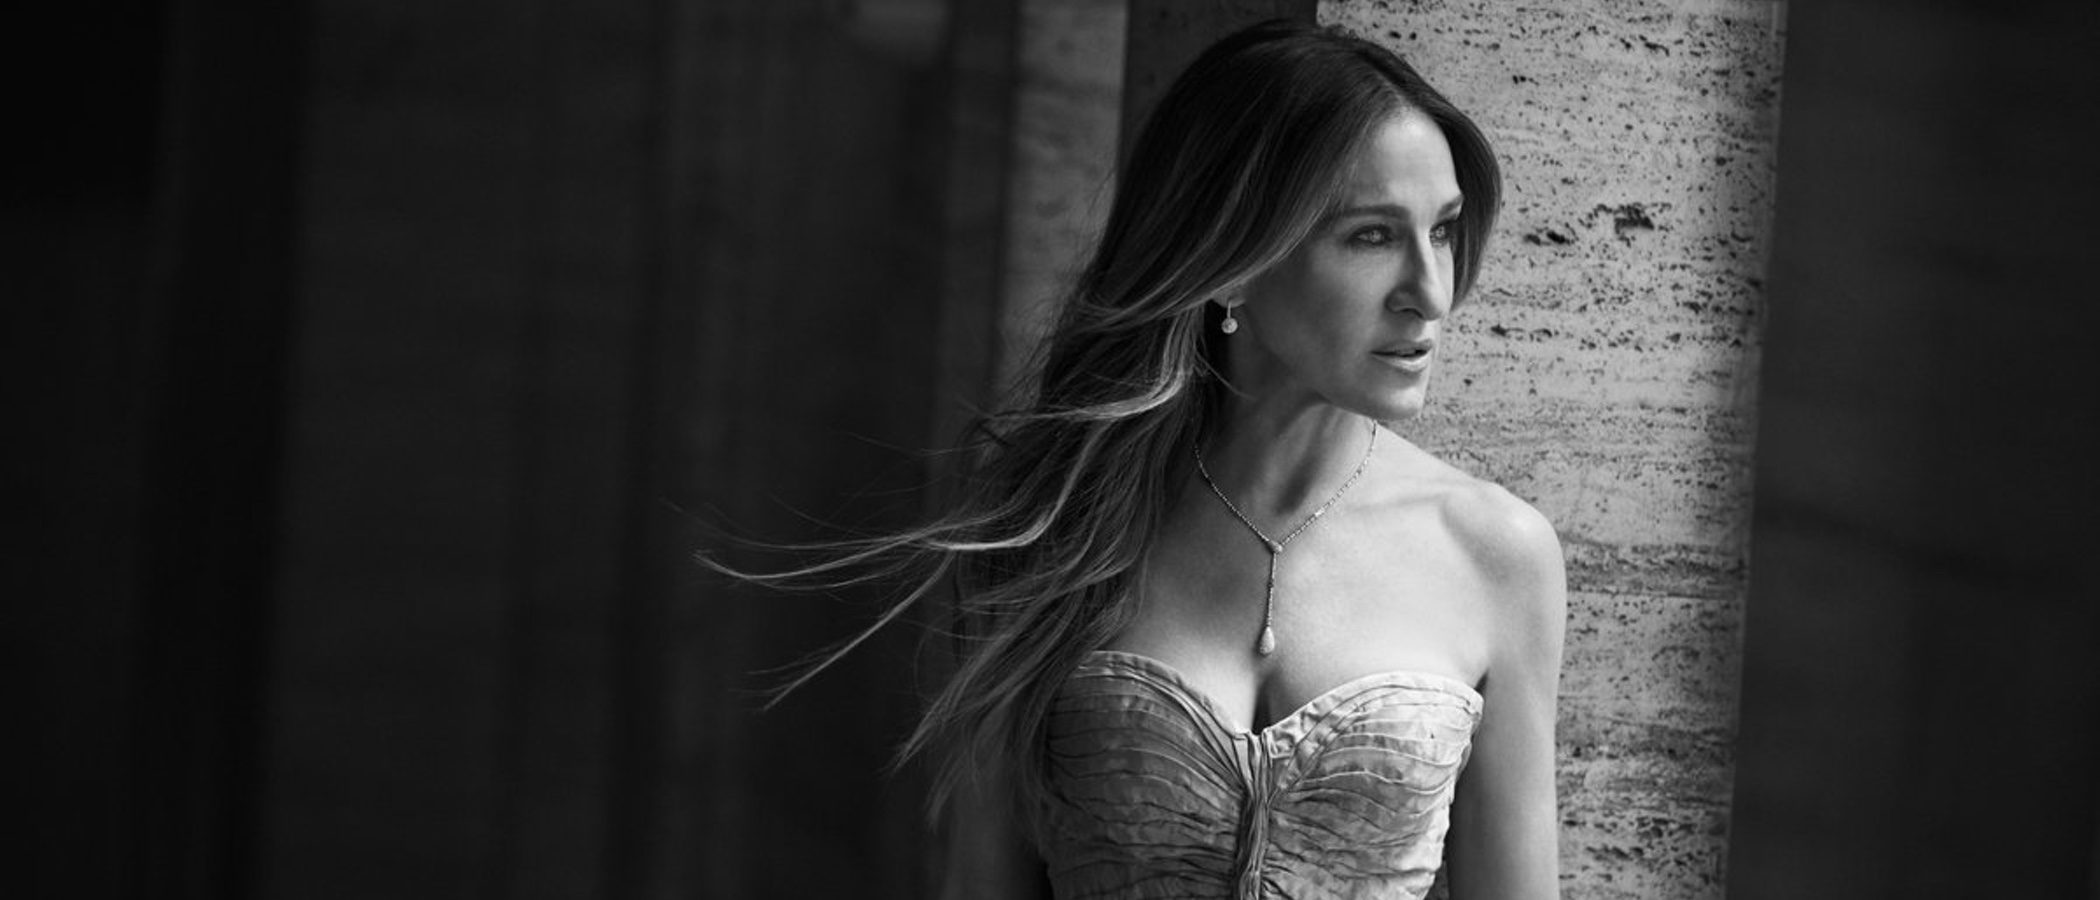 Sarah Jessica Parker se lanza a diseñar una línea de joyas con Kat Florence